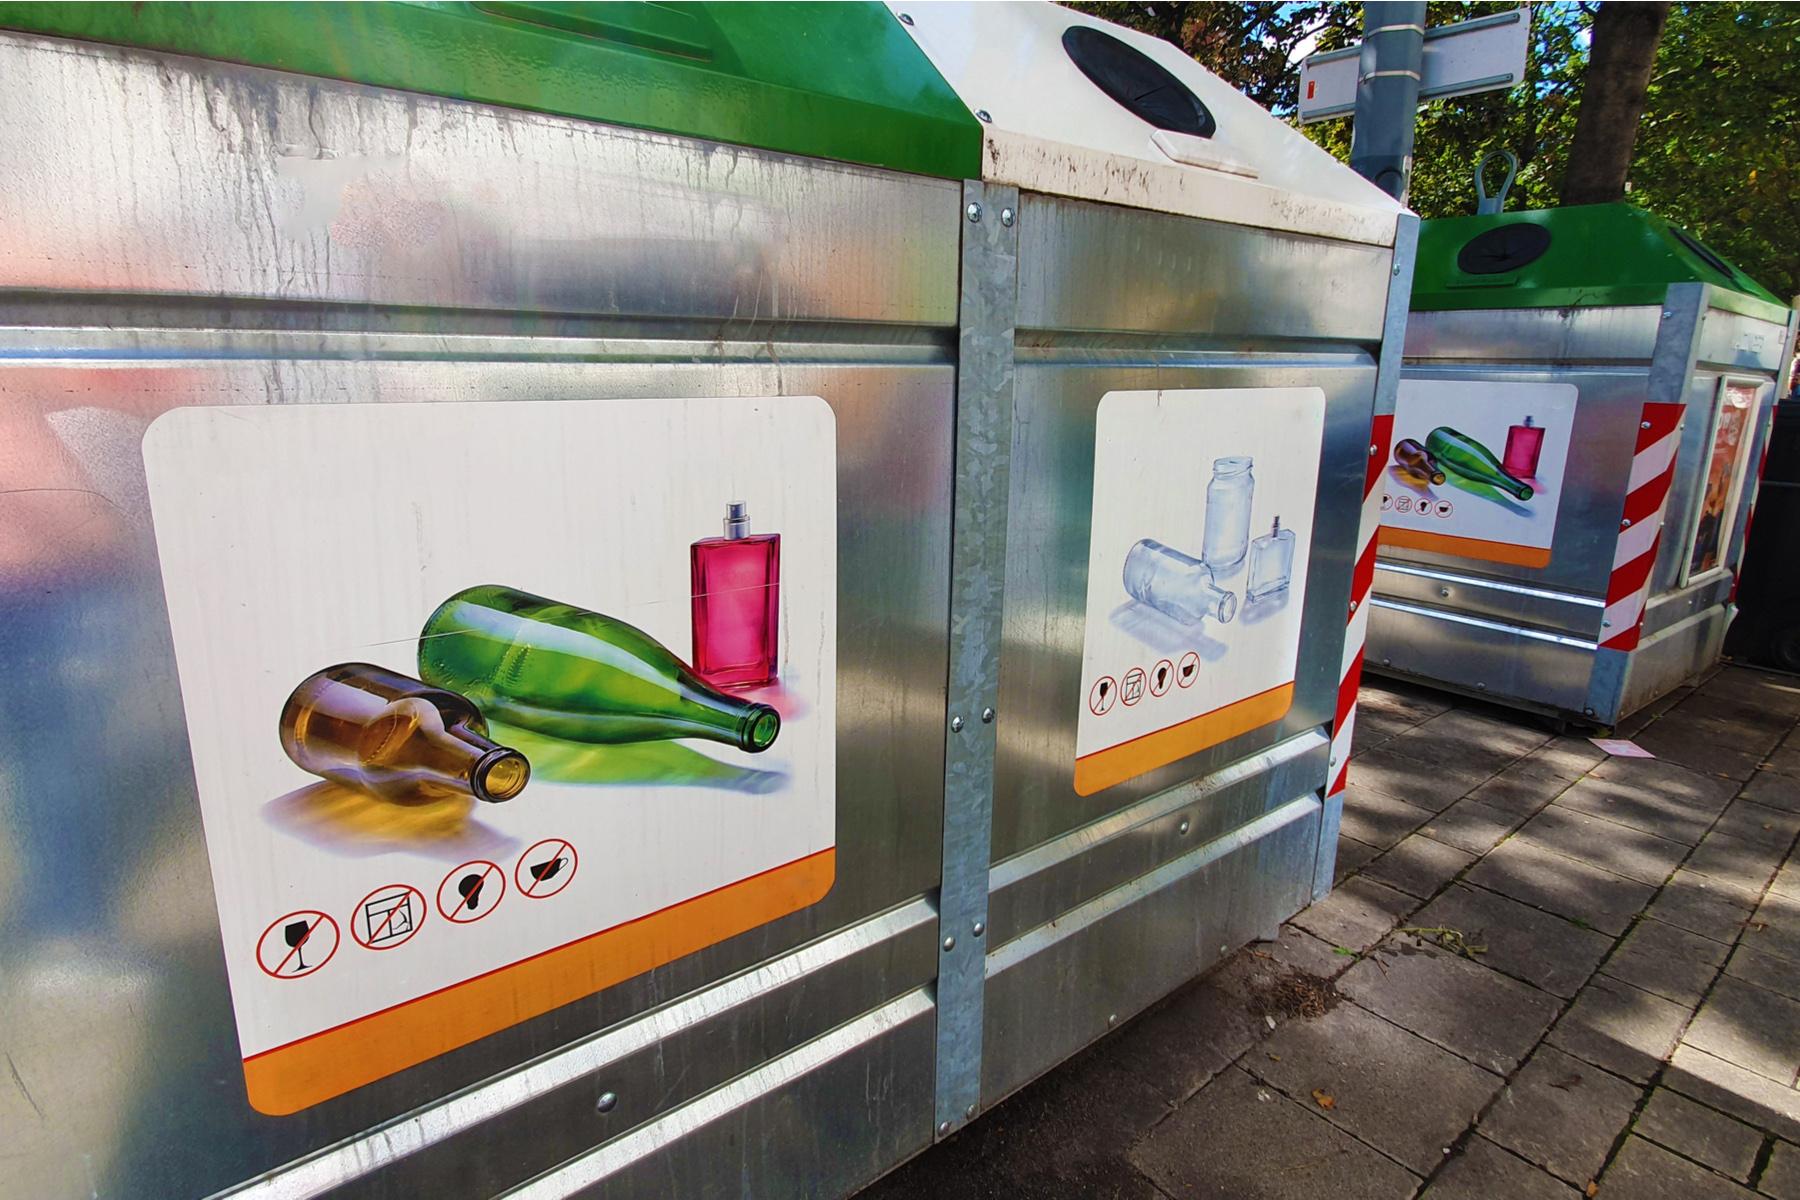 Recycling bins in Vienna